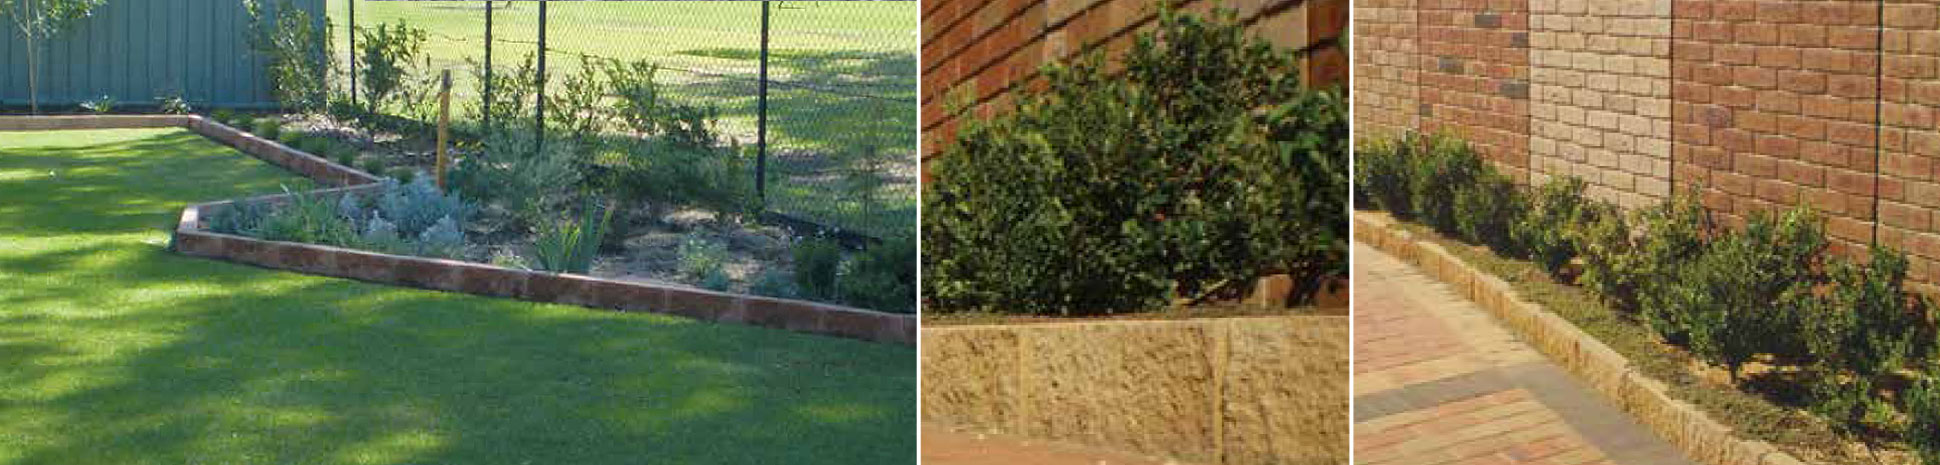 cowra concrete products garden edging